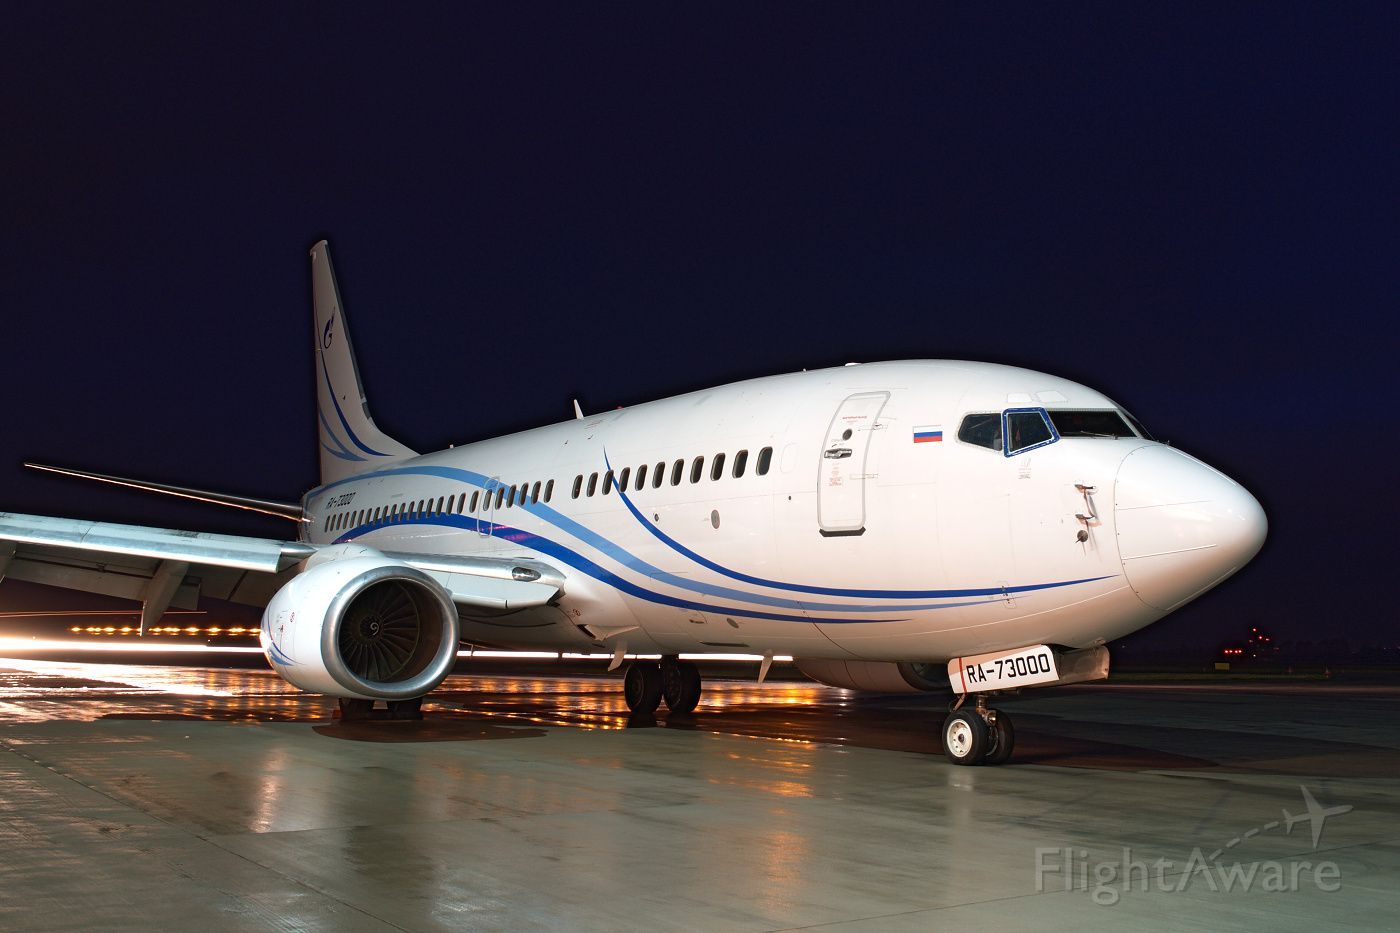 Boeing 737-700 (RA-73000) - Gazpromavia, December 17th, 2012